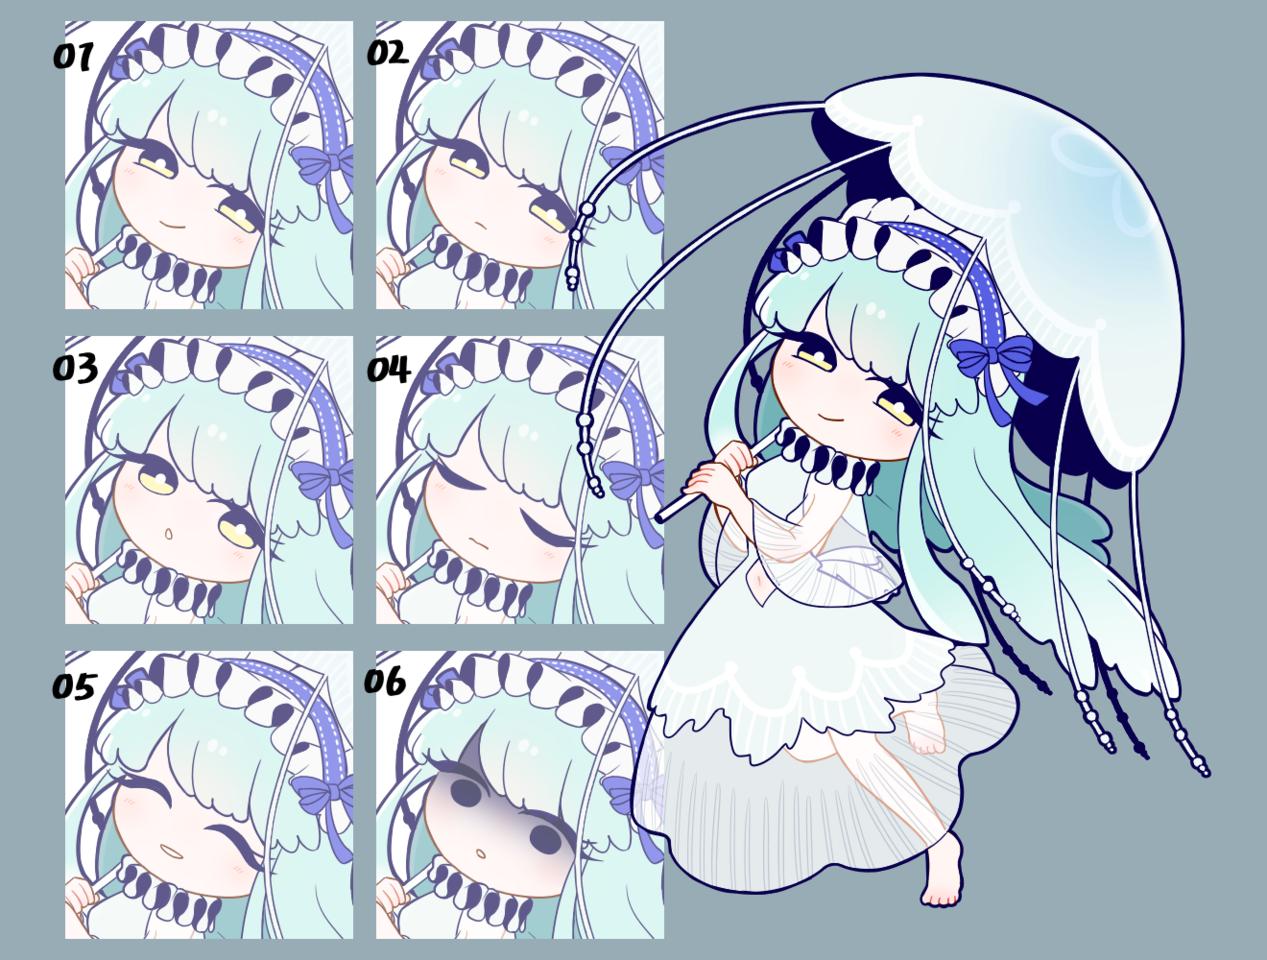 jellyfish_立ち絵素材 Illust of 空雀(そらすずめ) 立ち絵 素材 girl